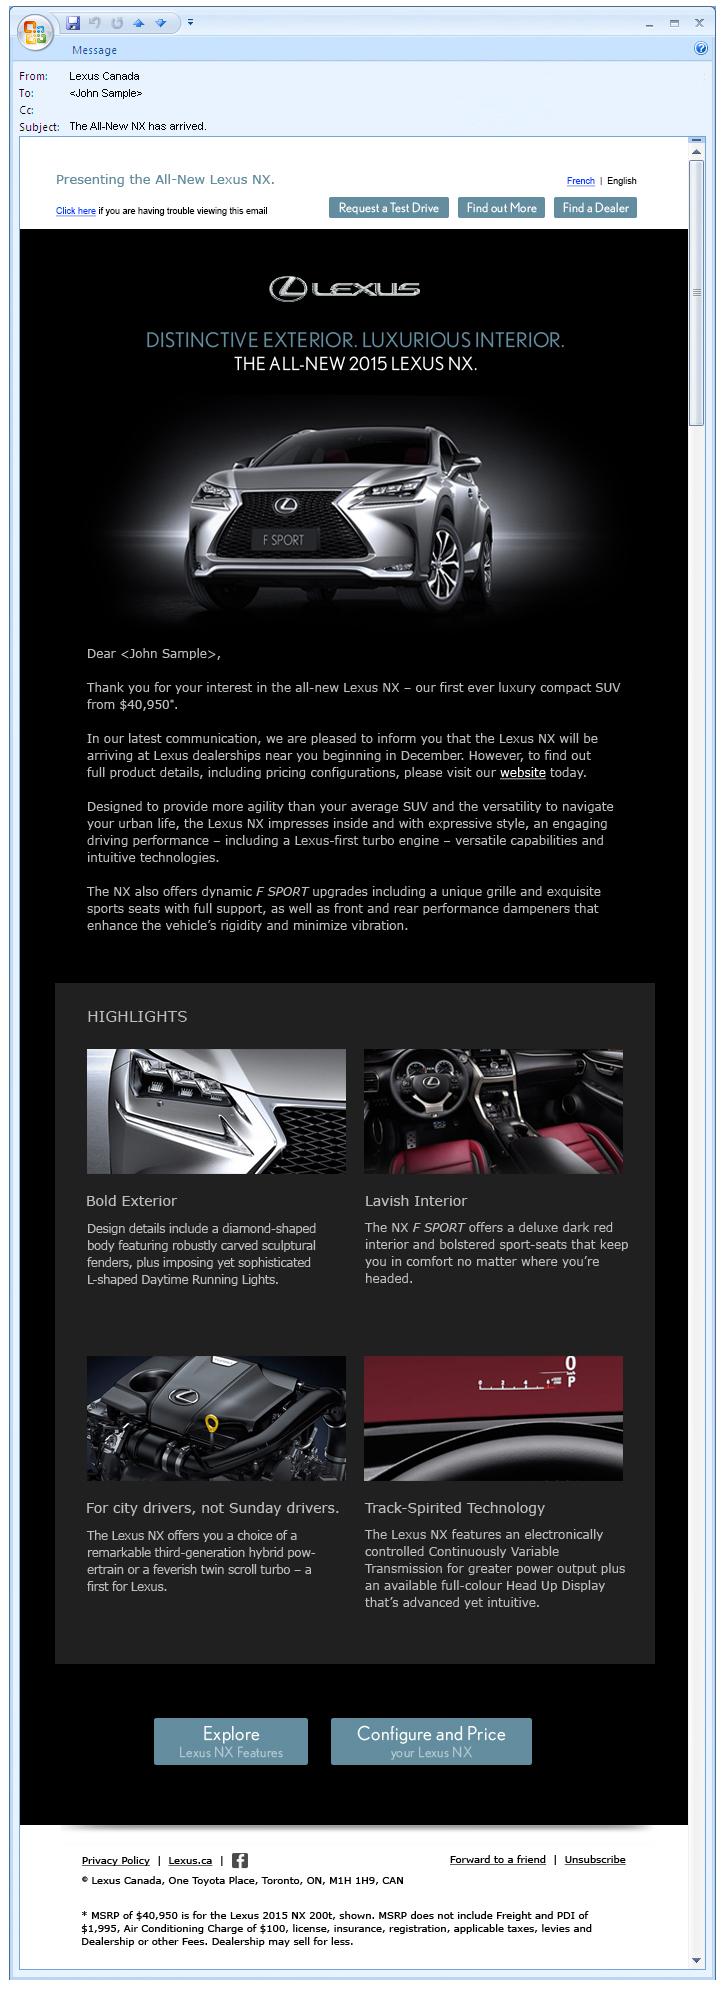 LexusNX_email_rev2